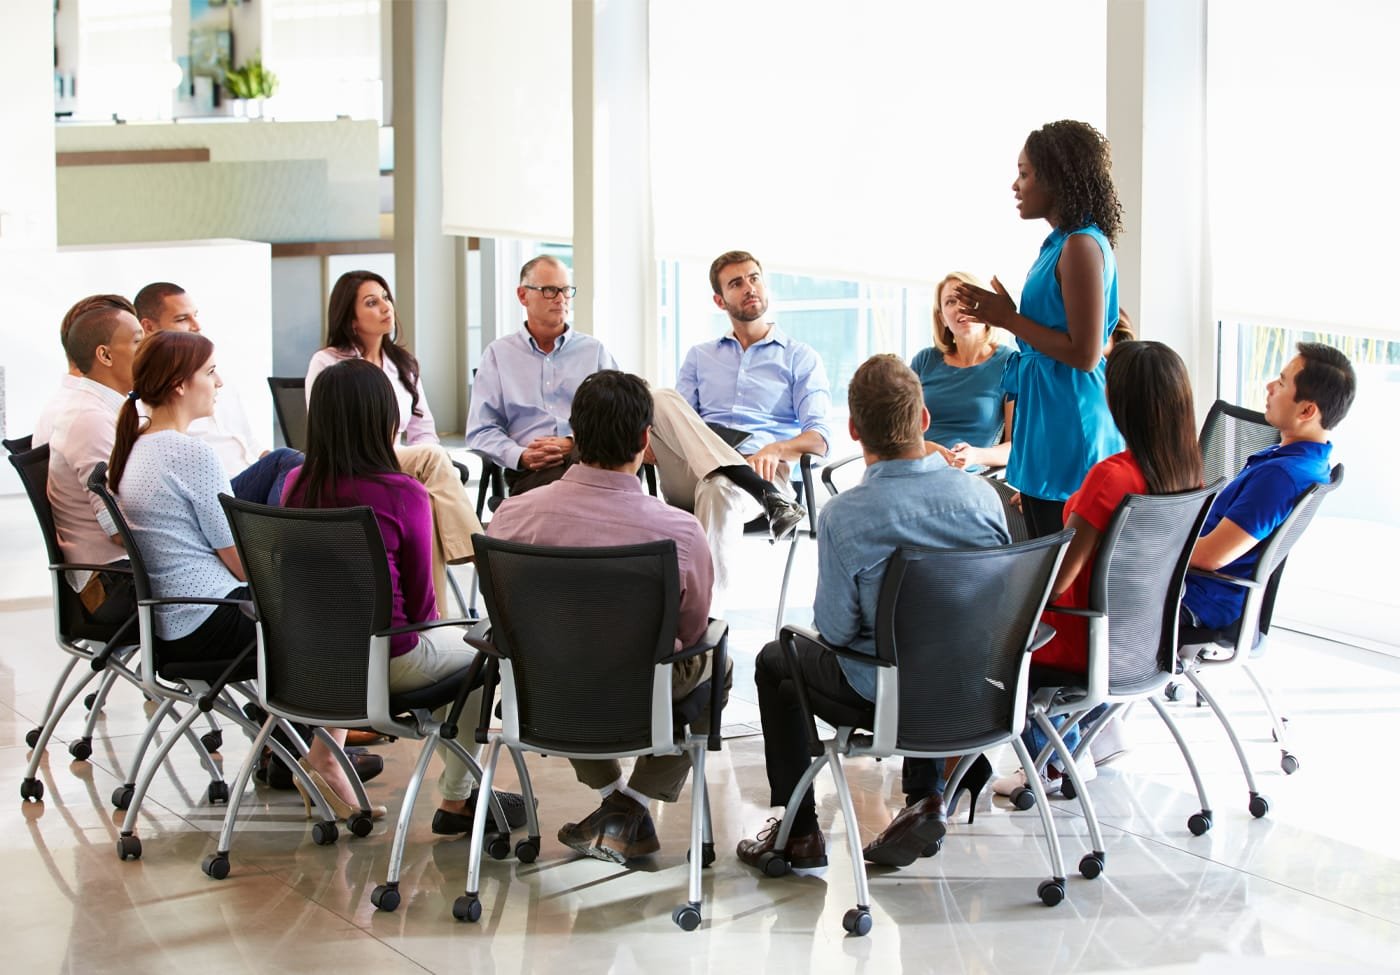 Businesswoman addressing multi-cultural office staff